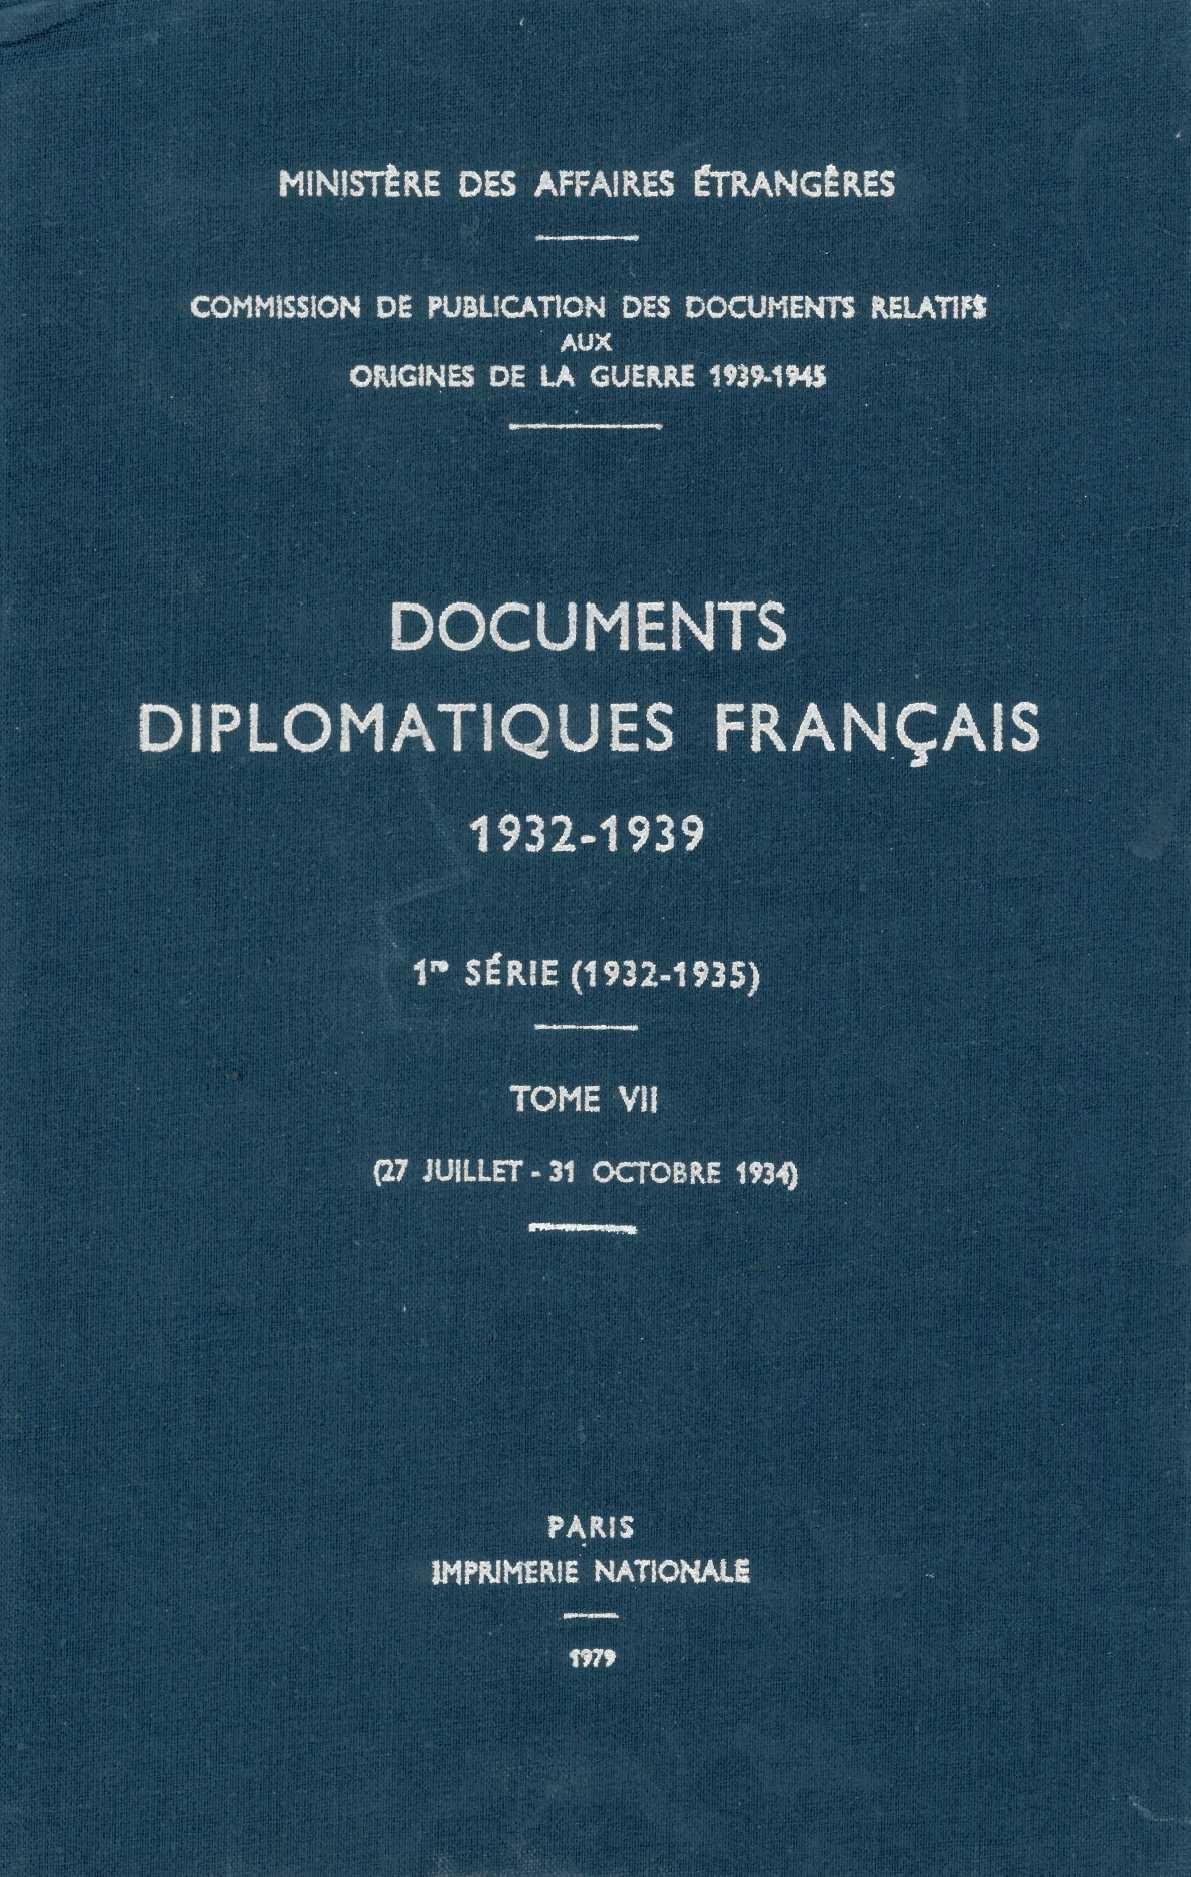 DOCUMENTS DIPLOMATIQUES FRANCAIS - 1934 - TOME II (27 JUILLET - 31 OCTOBRE)